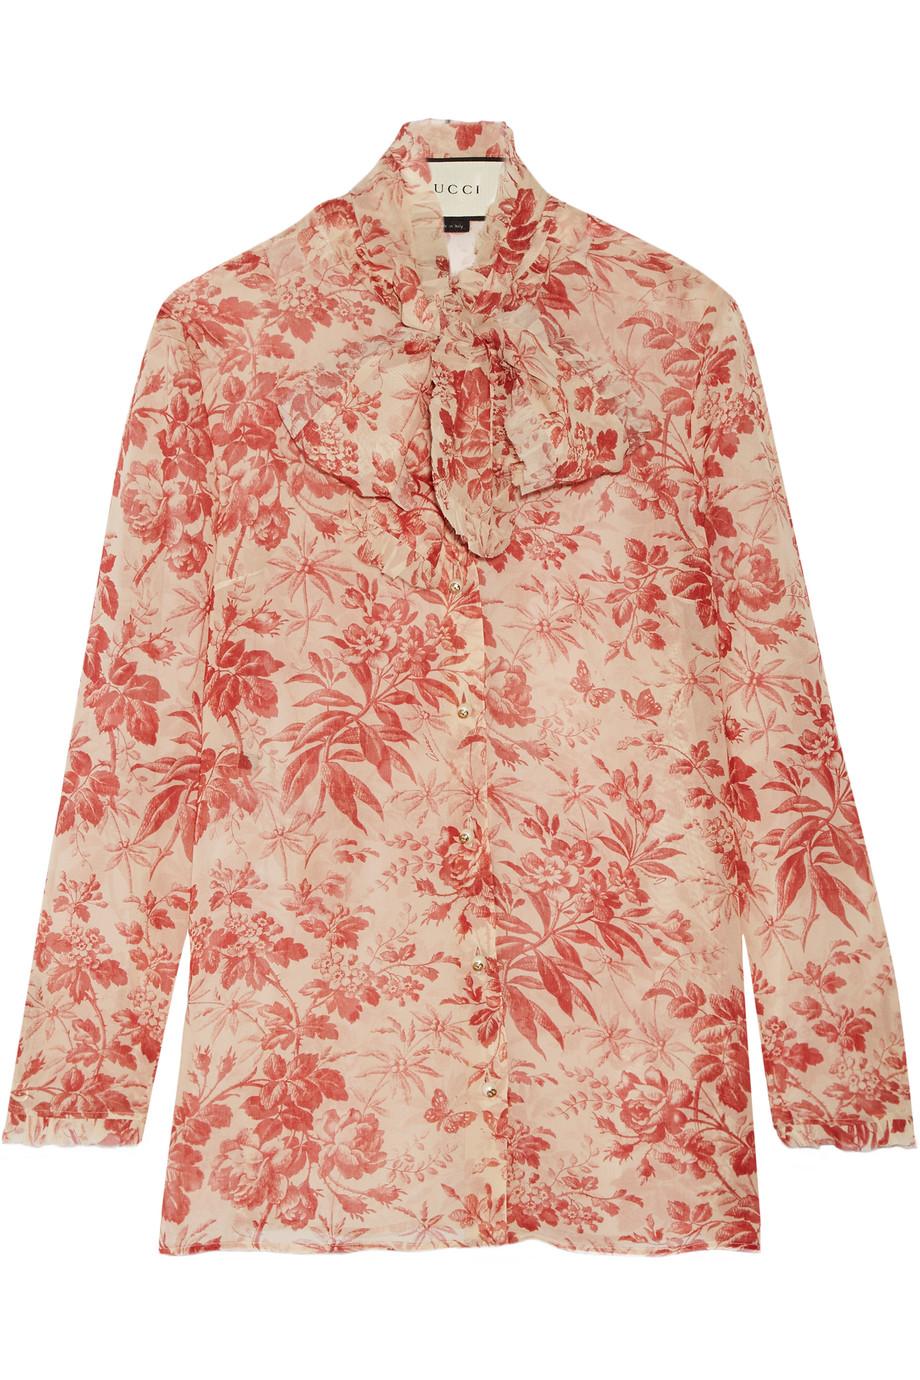 Gucci Pussy-Bow Printed Silk-Chiffon Blouse, Claret/Blush, Women's, Size: 44